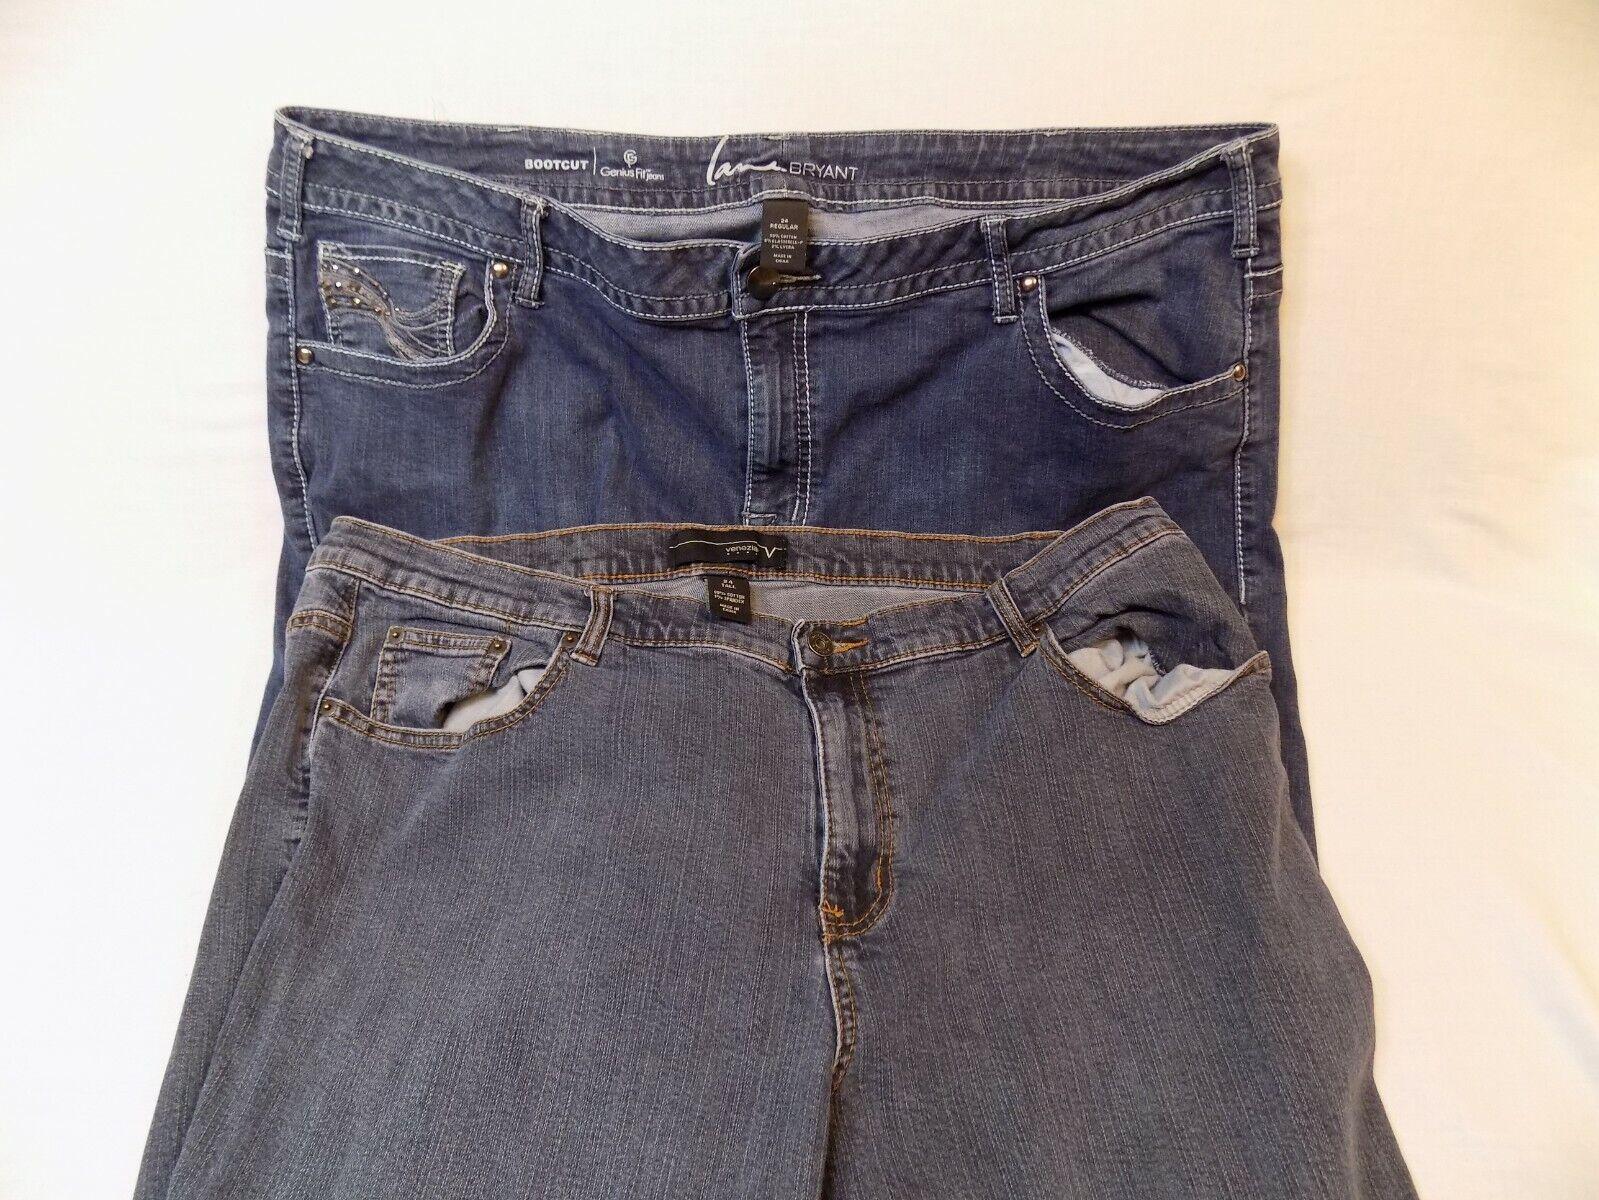 24 TALL Womens bluee Jeans Pants LOT Pair Lane Bryant Bootcut Genius Fit Venezia